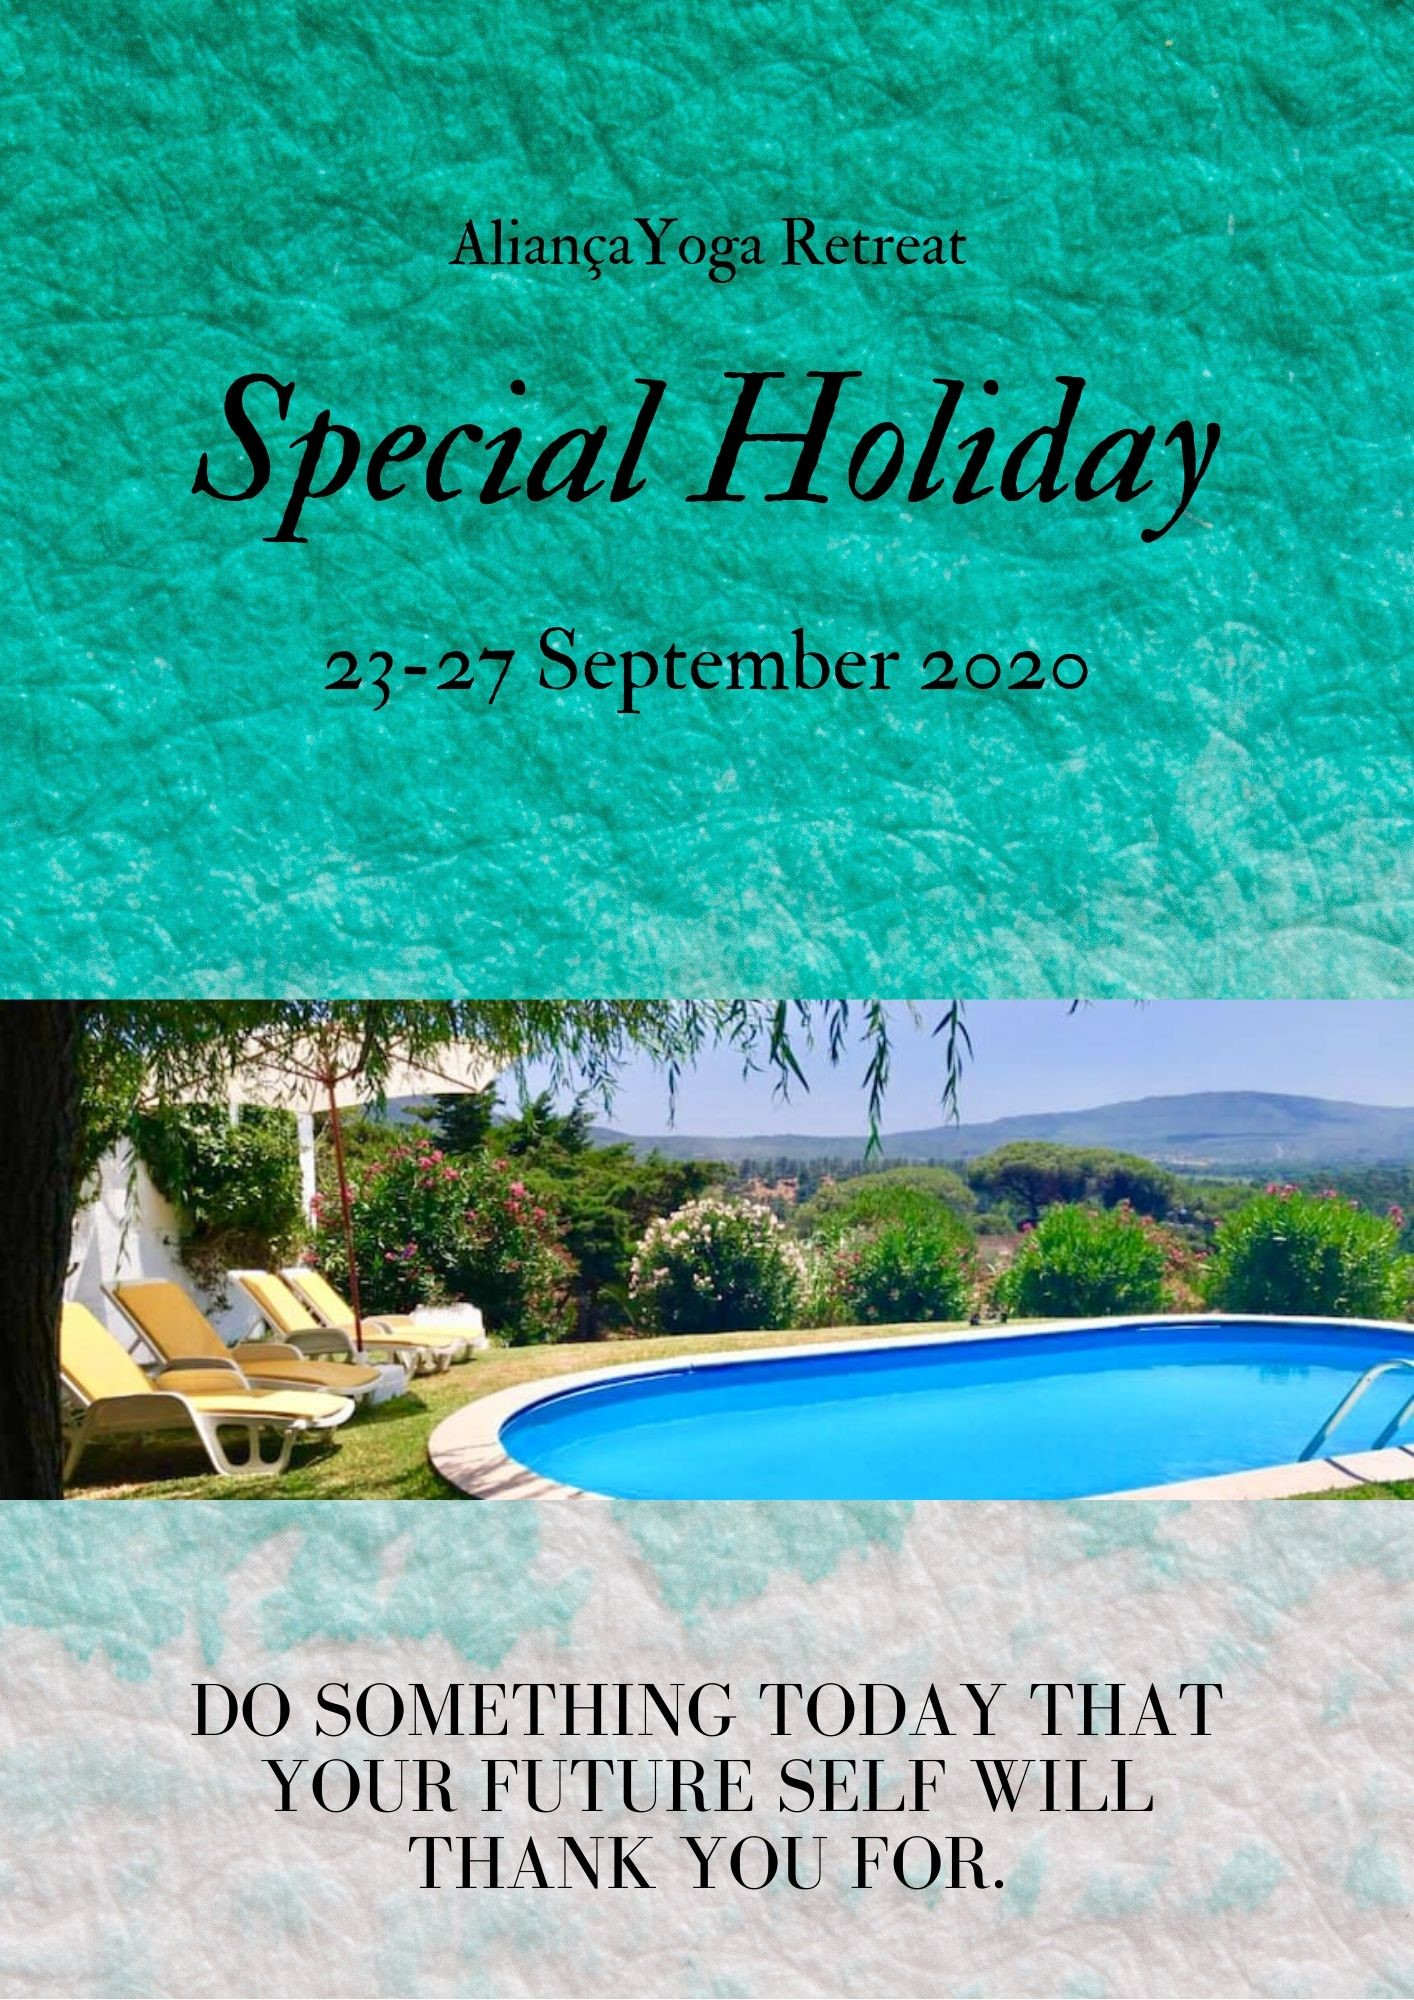 Special Holiday 23-27 September on Sep 23, 06:00@Special Holiday Arrábida - Buy tickets and Get information on Aliança Retreats